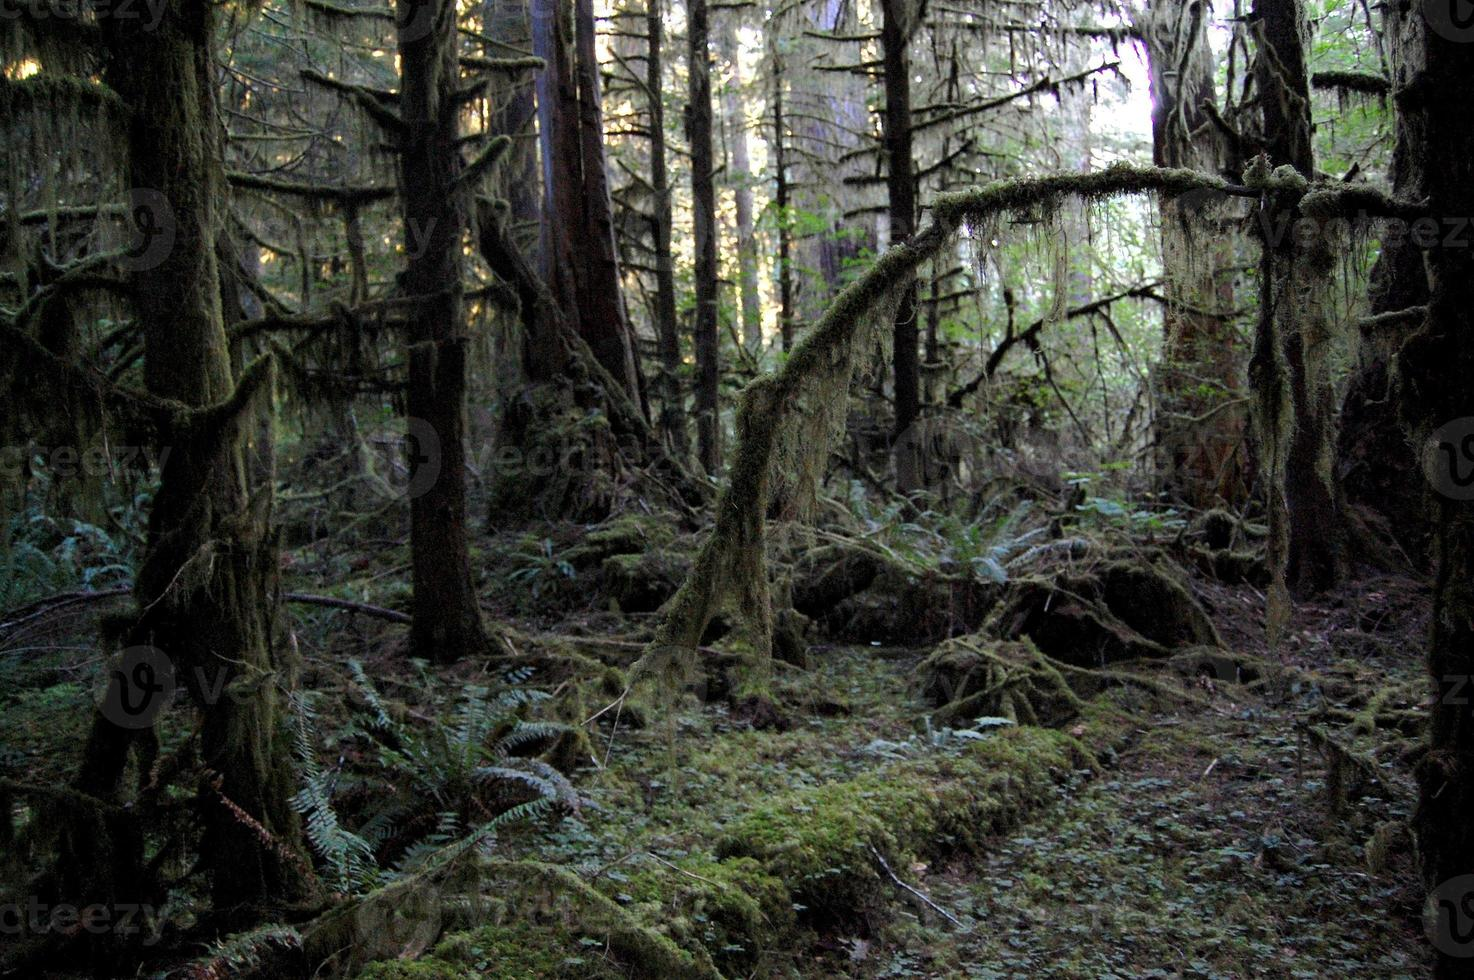 Pacific Northwest Douglas Fir trees photo